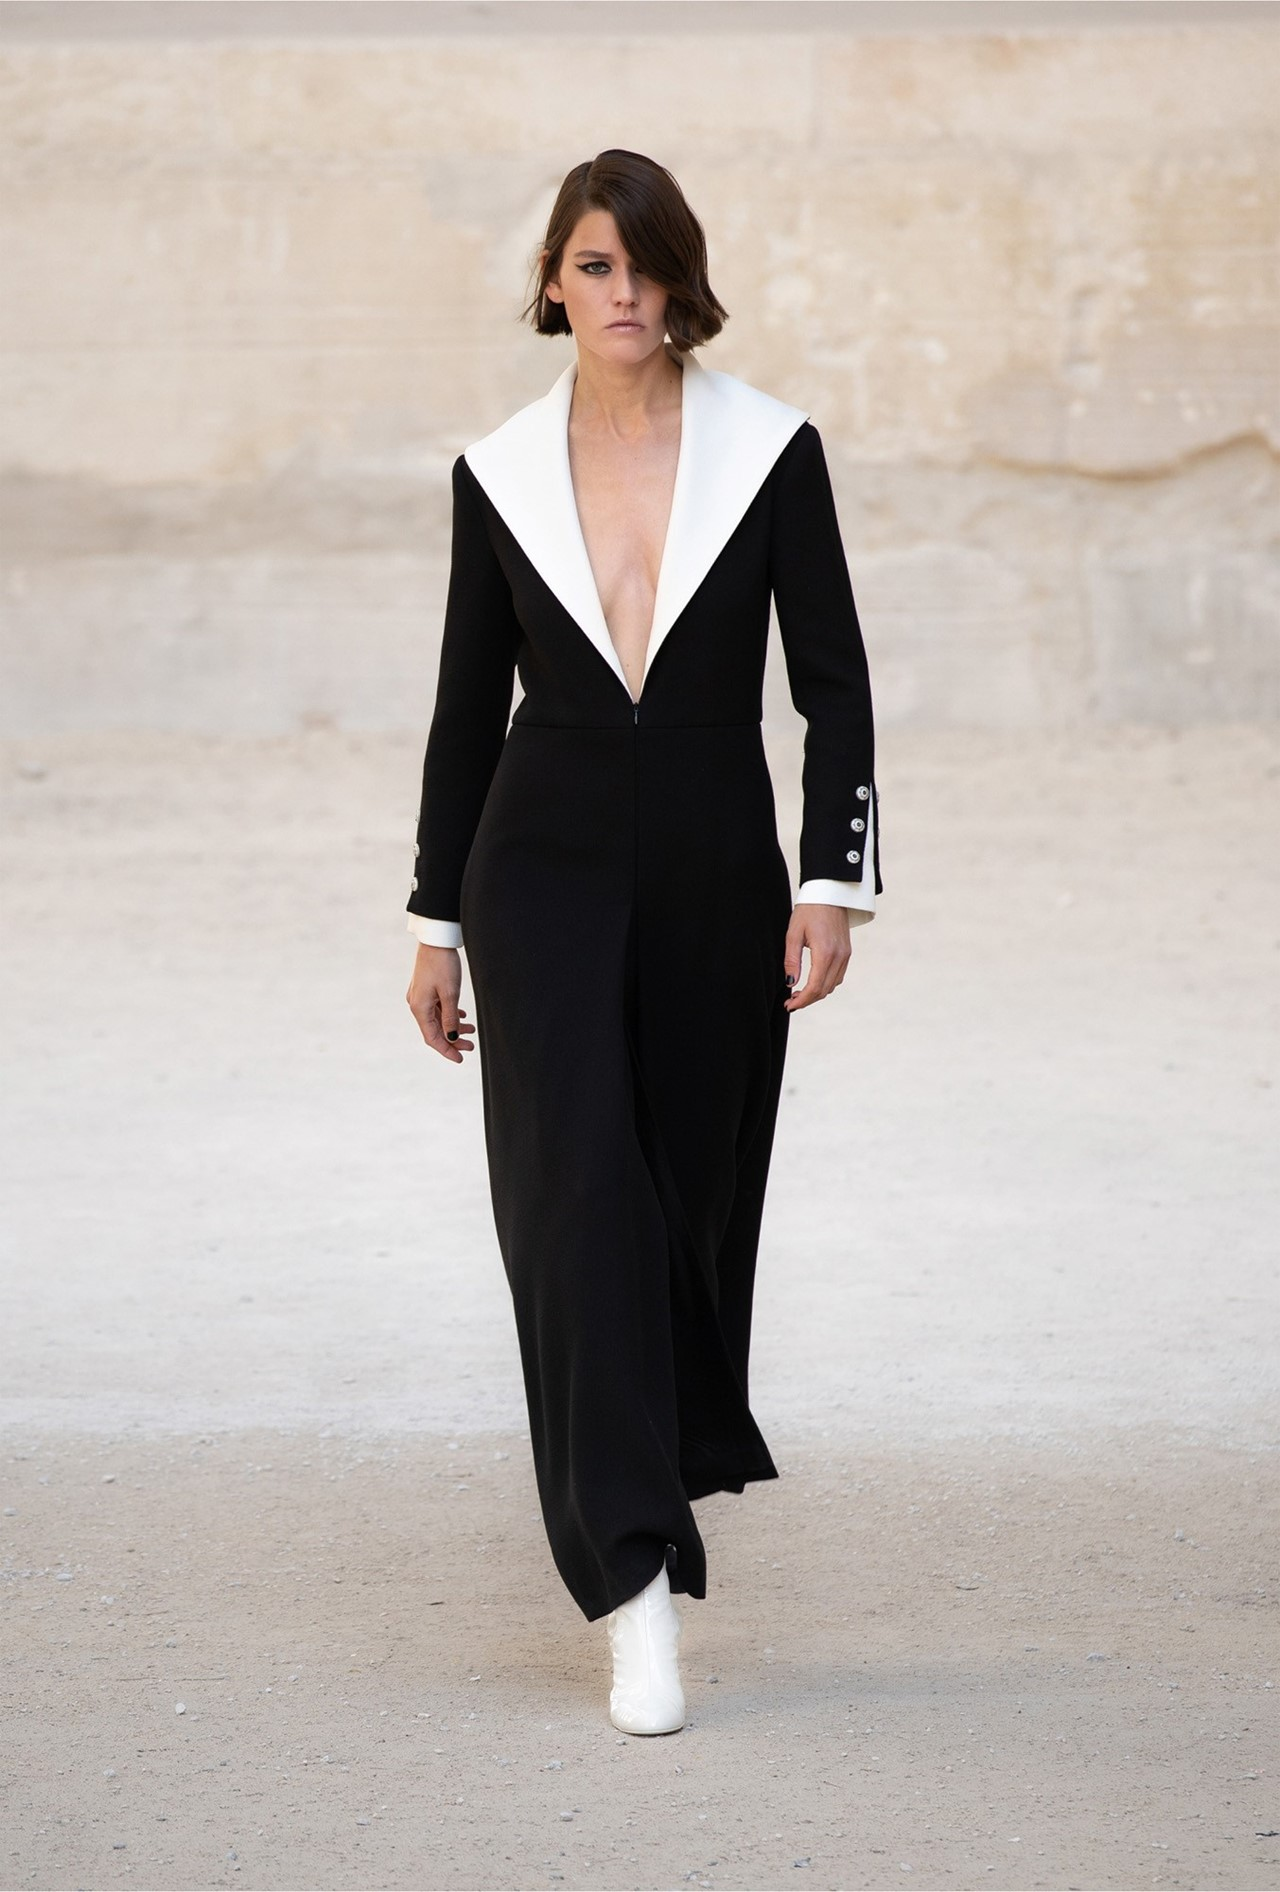 Chanel_Cruise_2022_Fashionela (6)